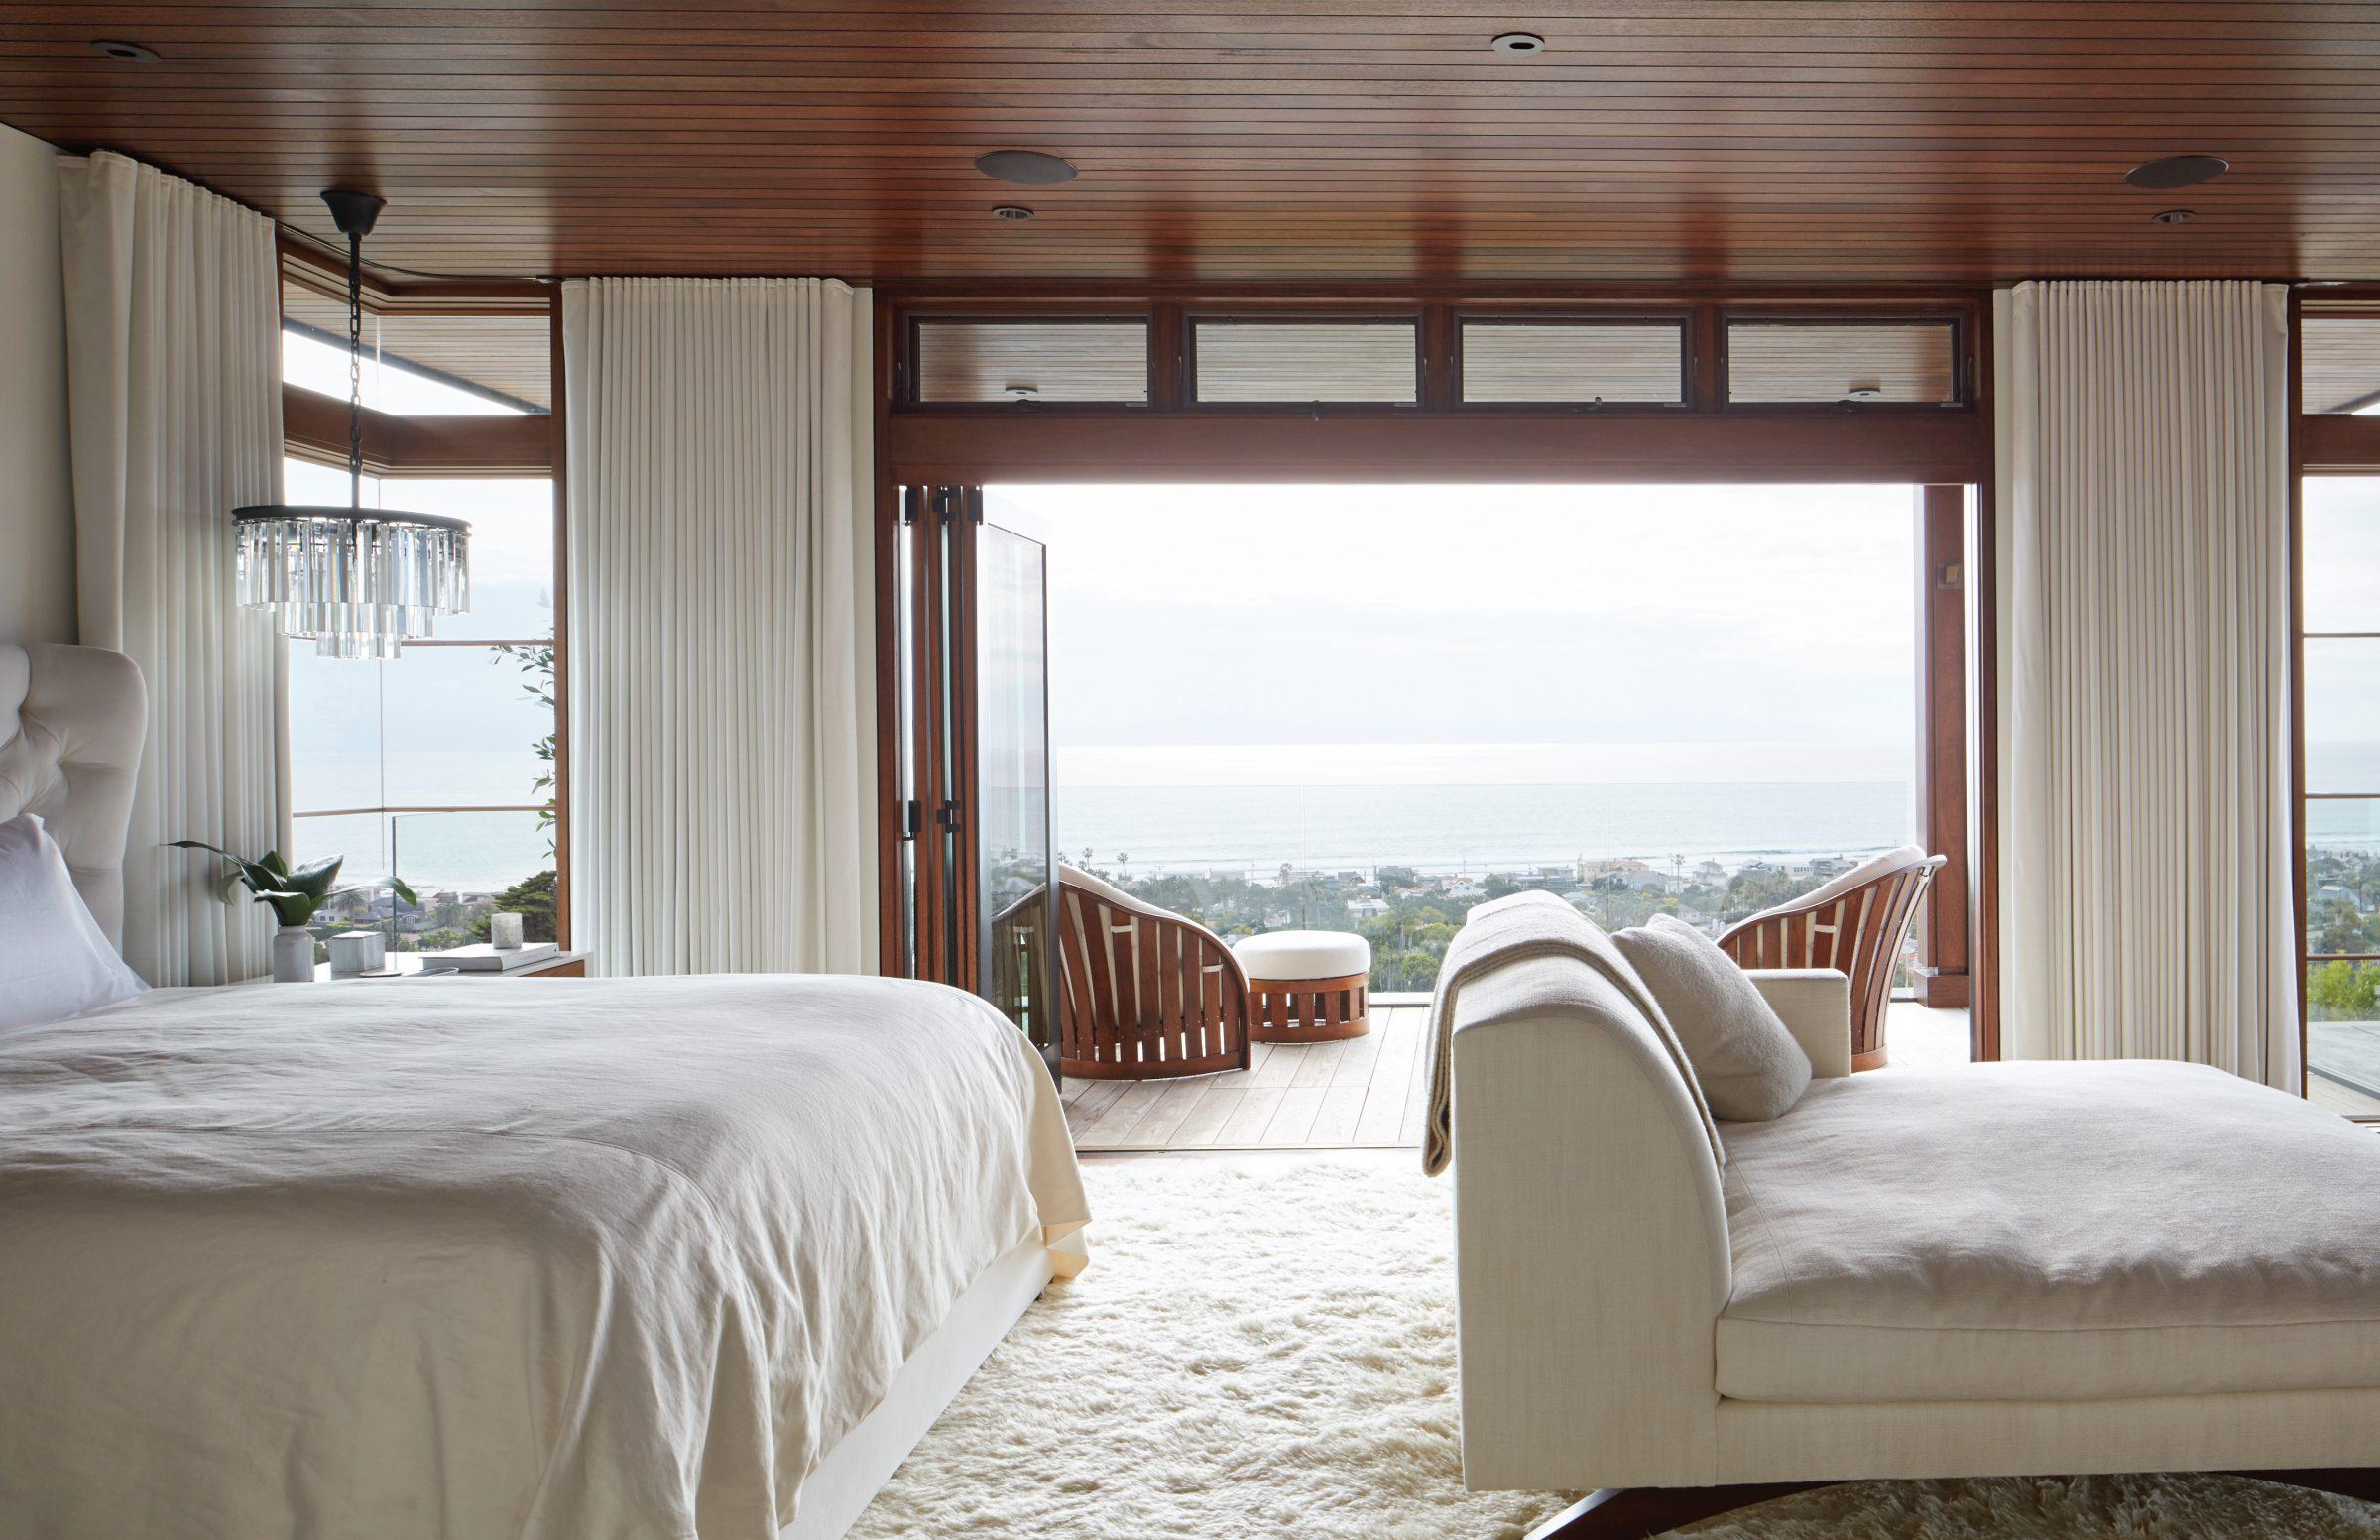 Beach Pretty Style: The Seaside House by Mark J. Williams..Take a Tour